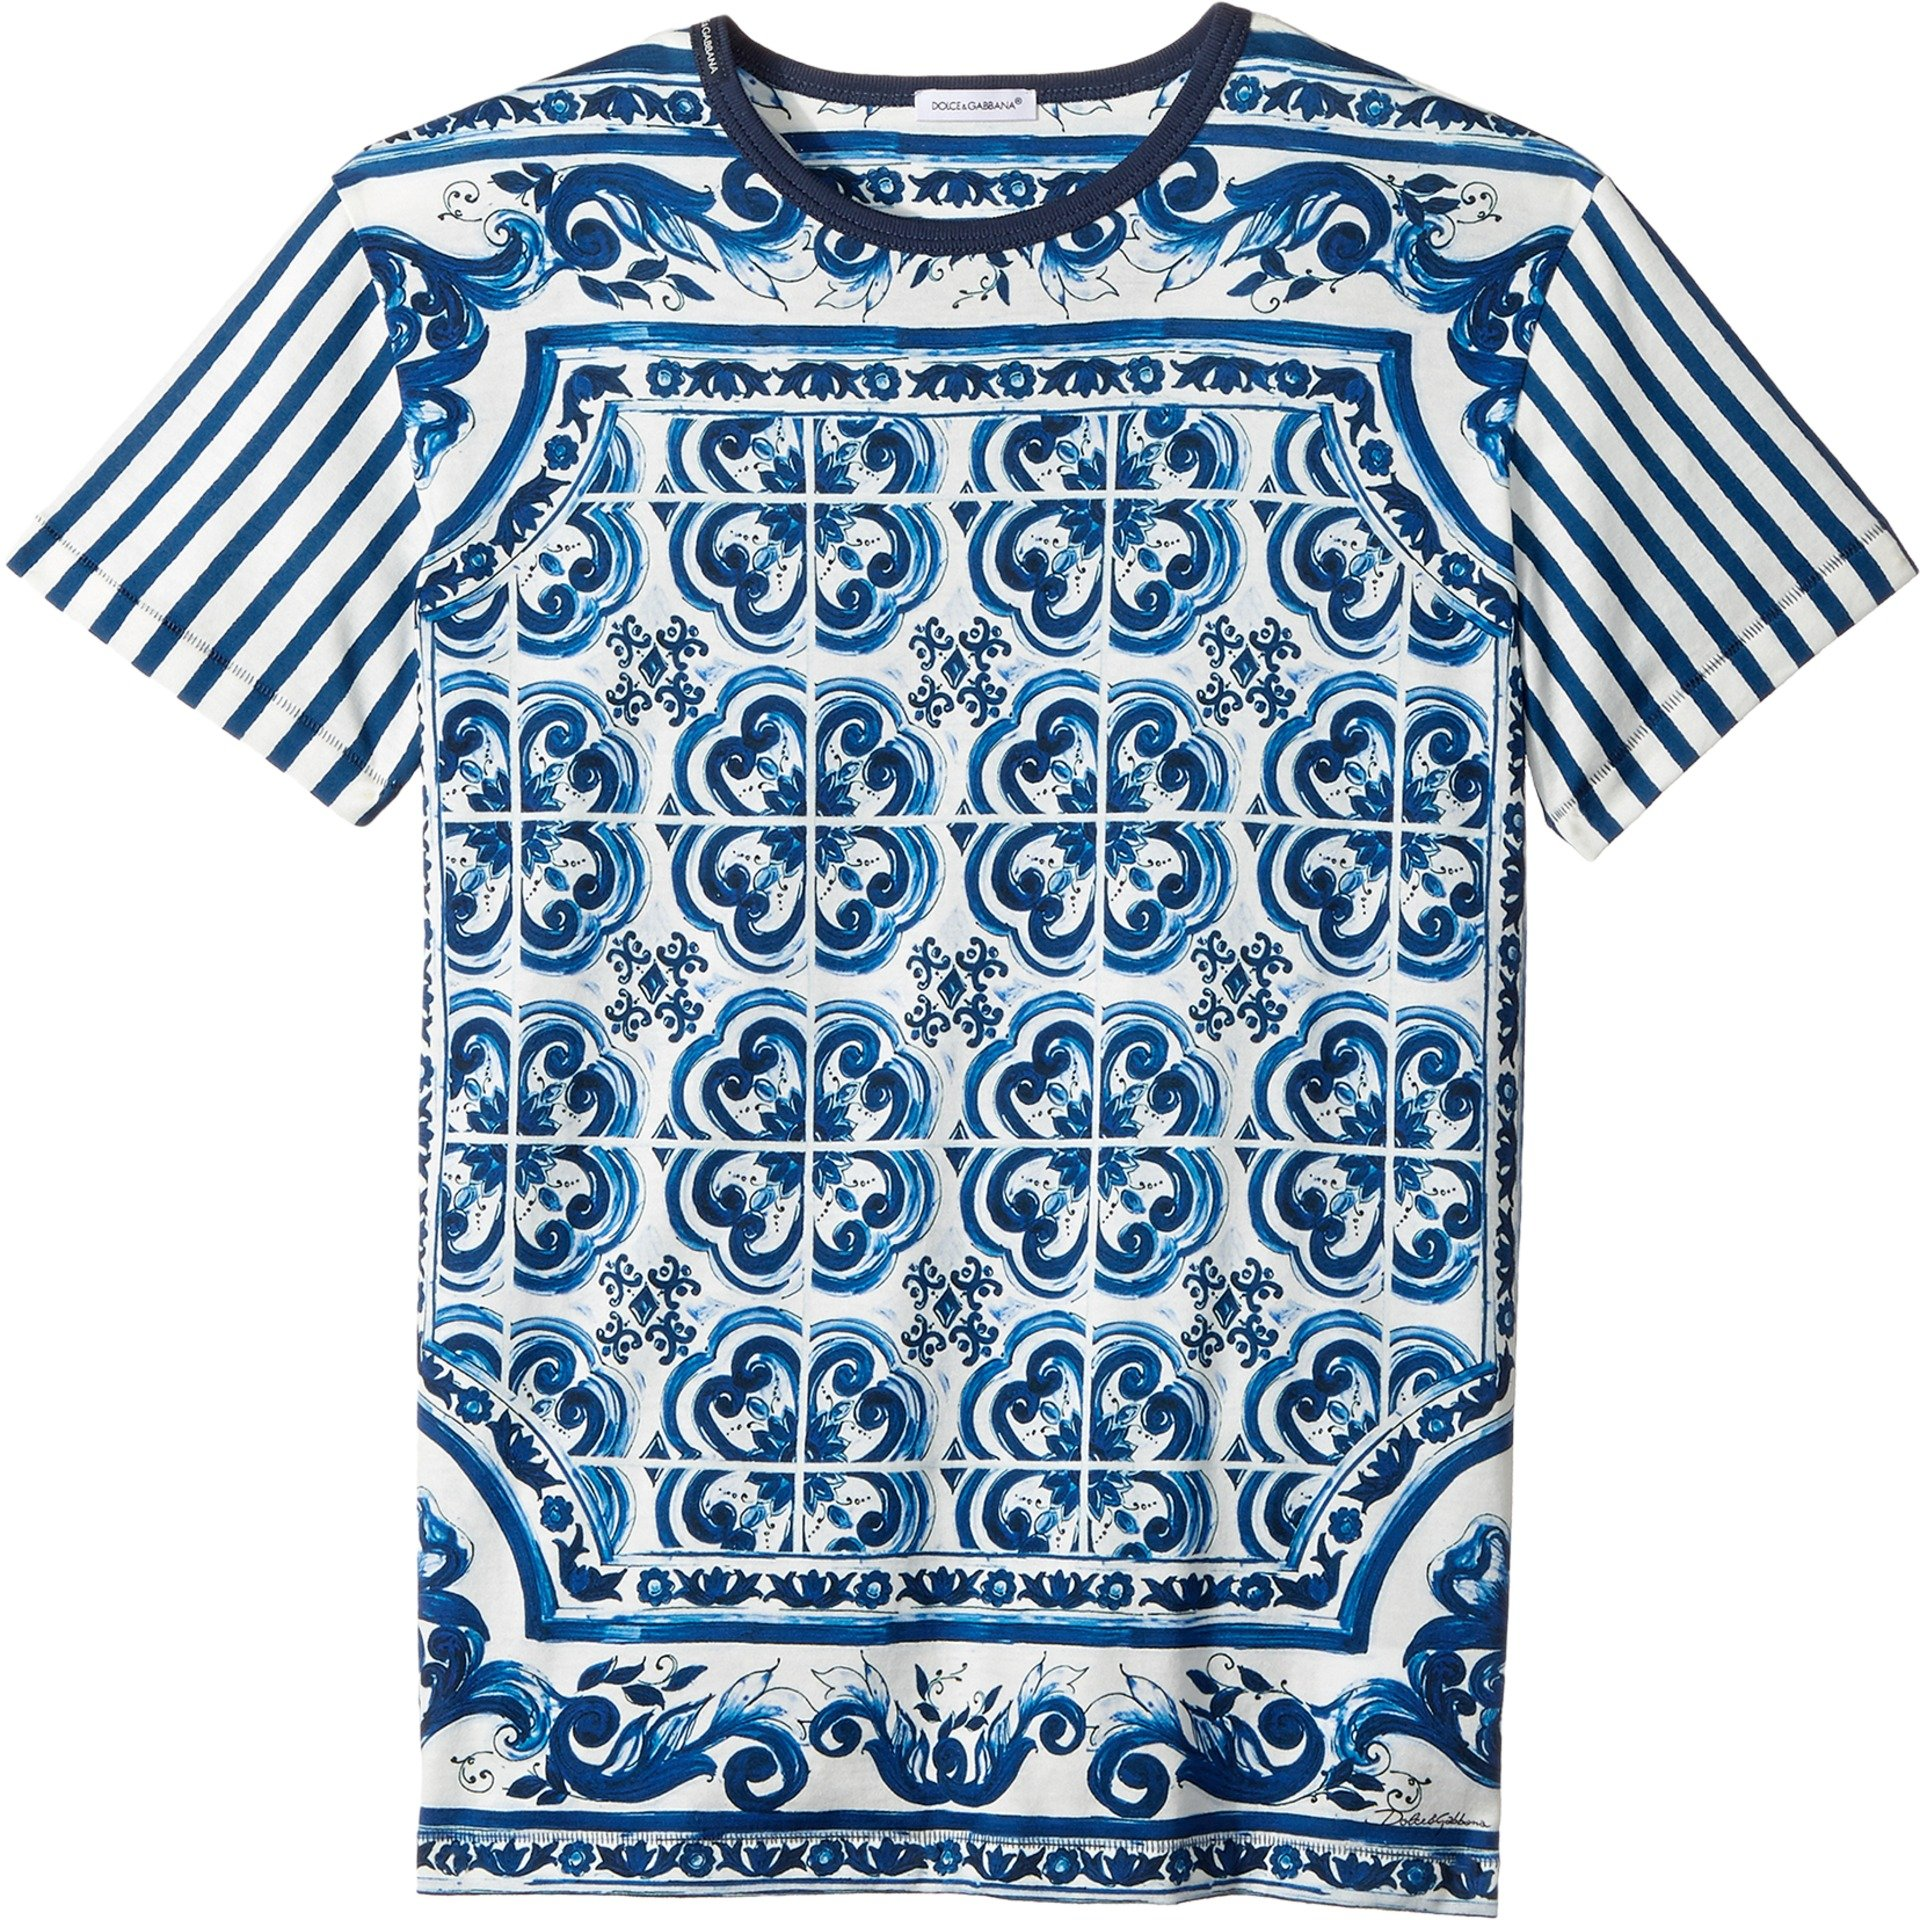 Dolce & Gabbana Kids Boy's Capri Striped Maiolica T-Shirt (Big Kids) Blue 12 Big Kids by Dolce & Gabbana